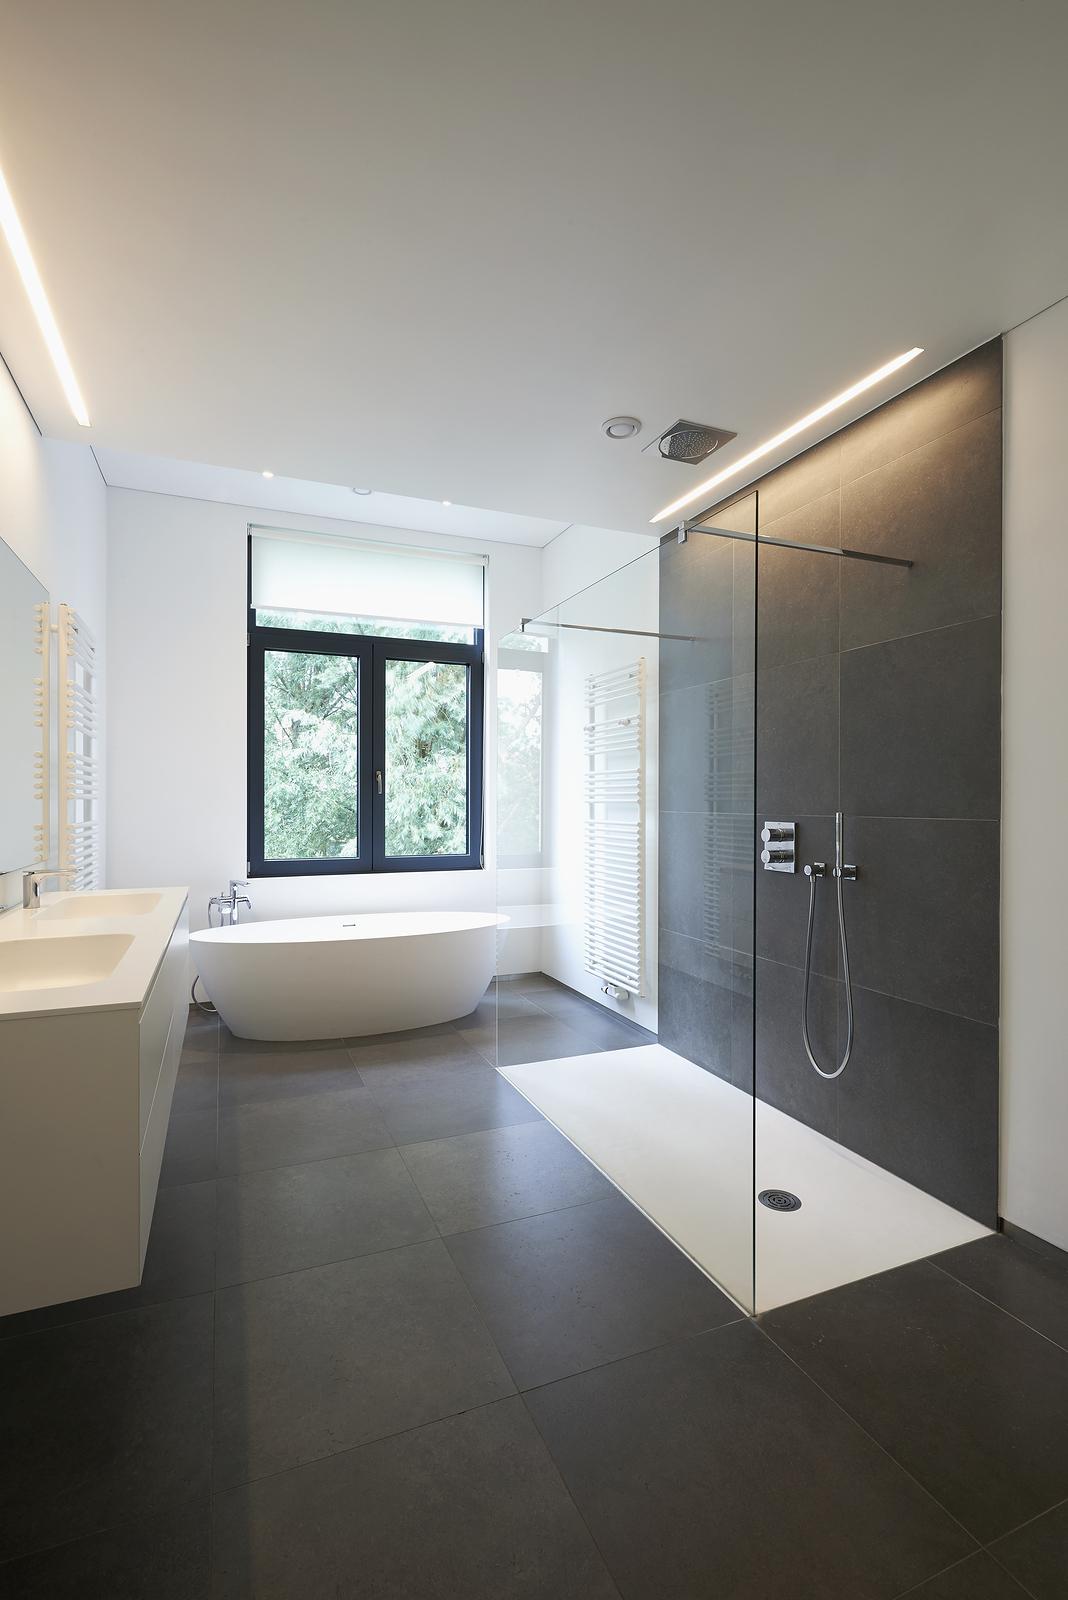 bigstock-Luxury-Modern-Bathroom-97240457